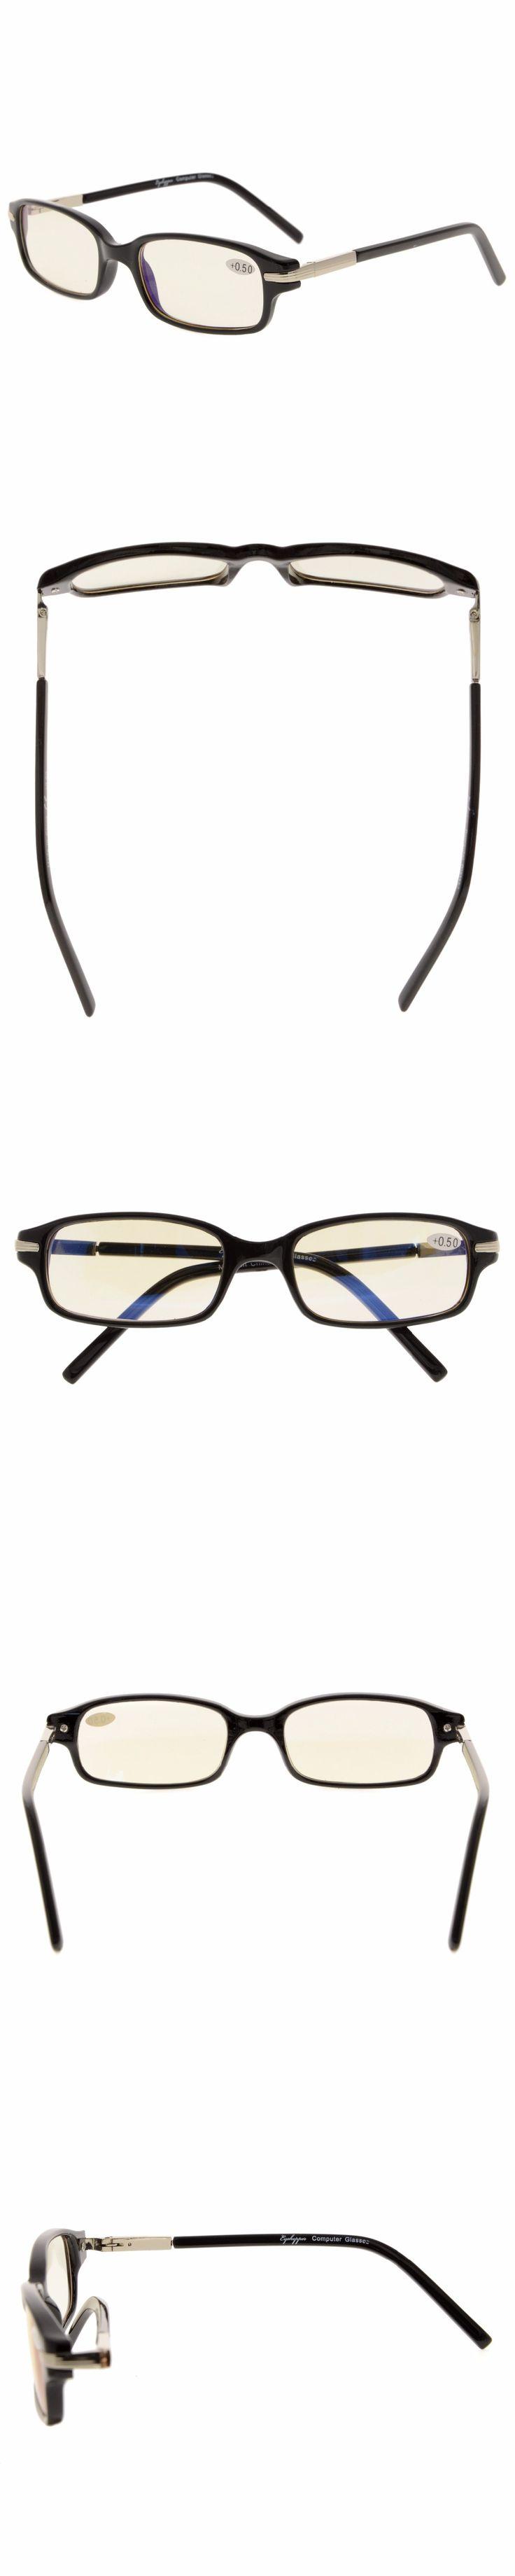 CG035 Eyekepper Spring Temple Classic Computer Reading Glasses UV Protection, Anti Glare Eyeglasses, Anti Blue Rays Readers